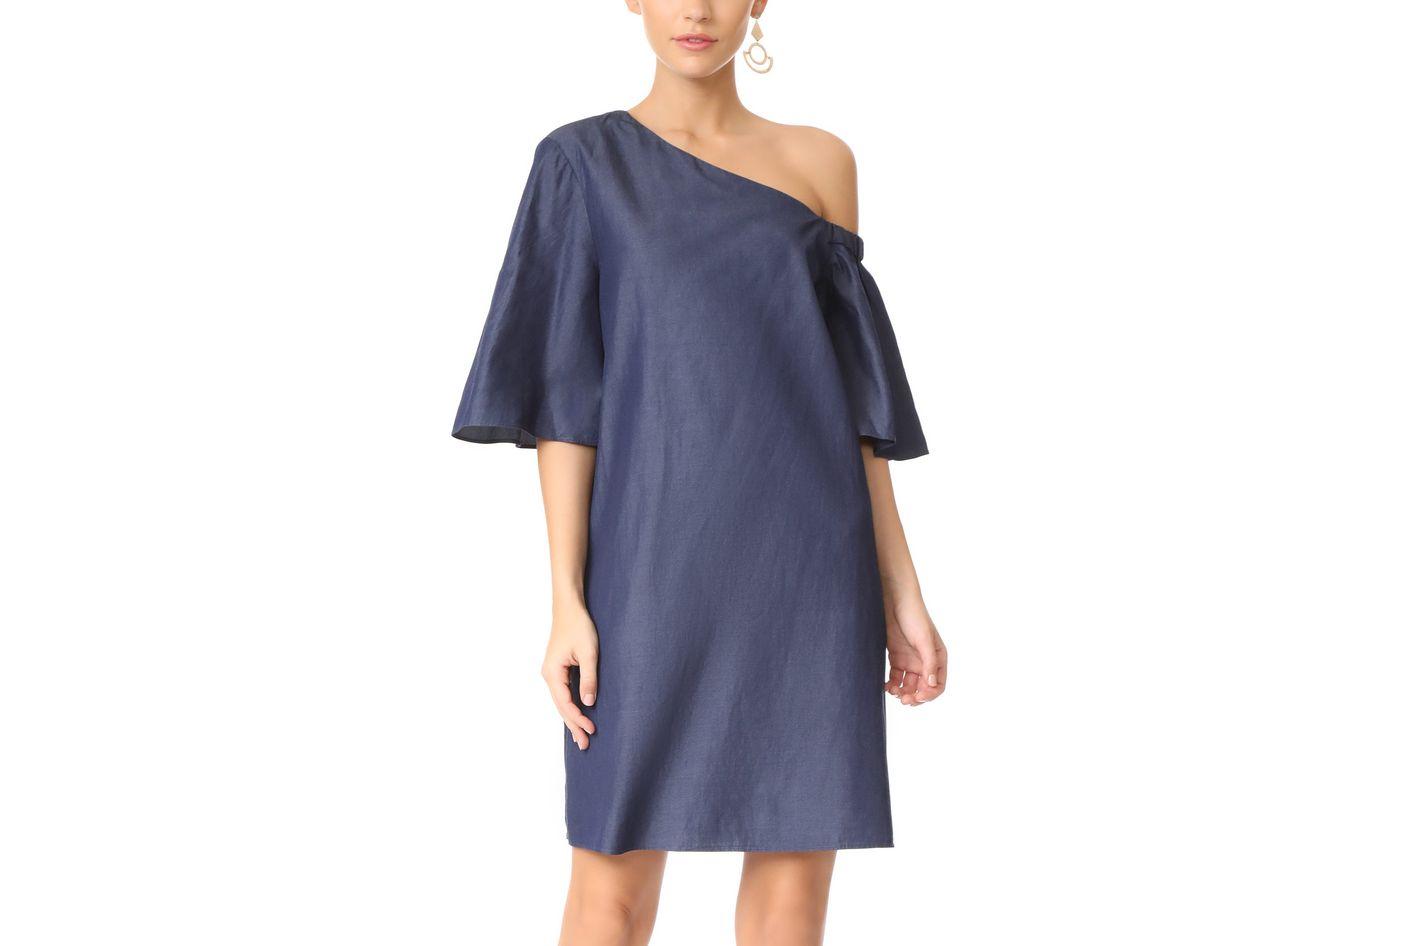 Tibi One-Shoulder Bell Sleeve Dress